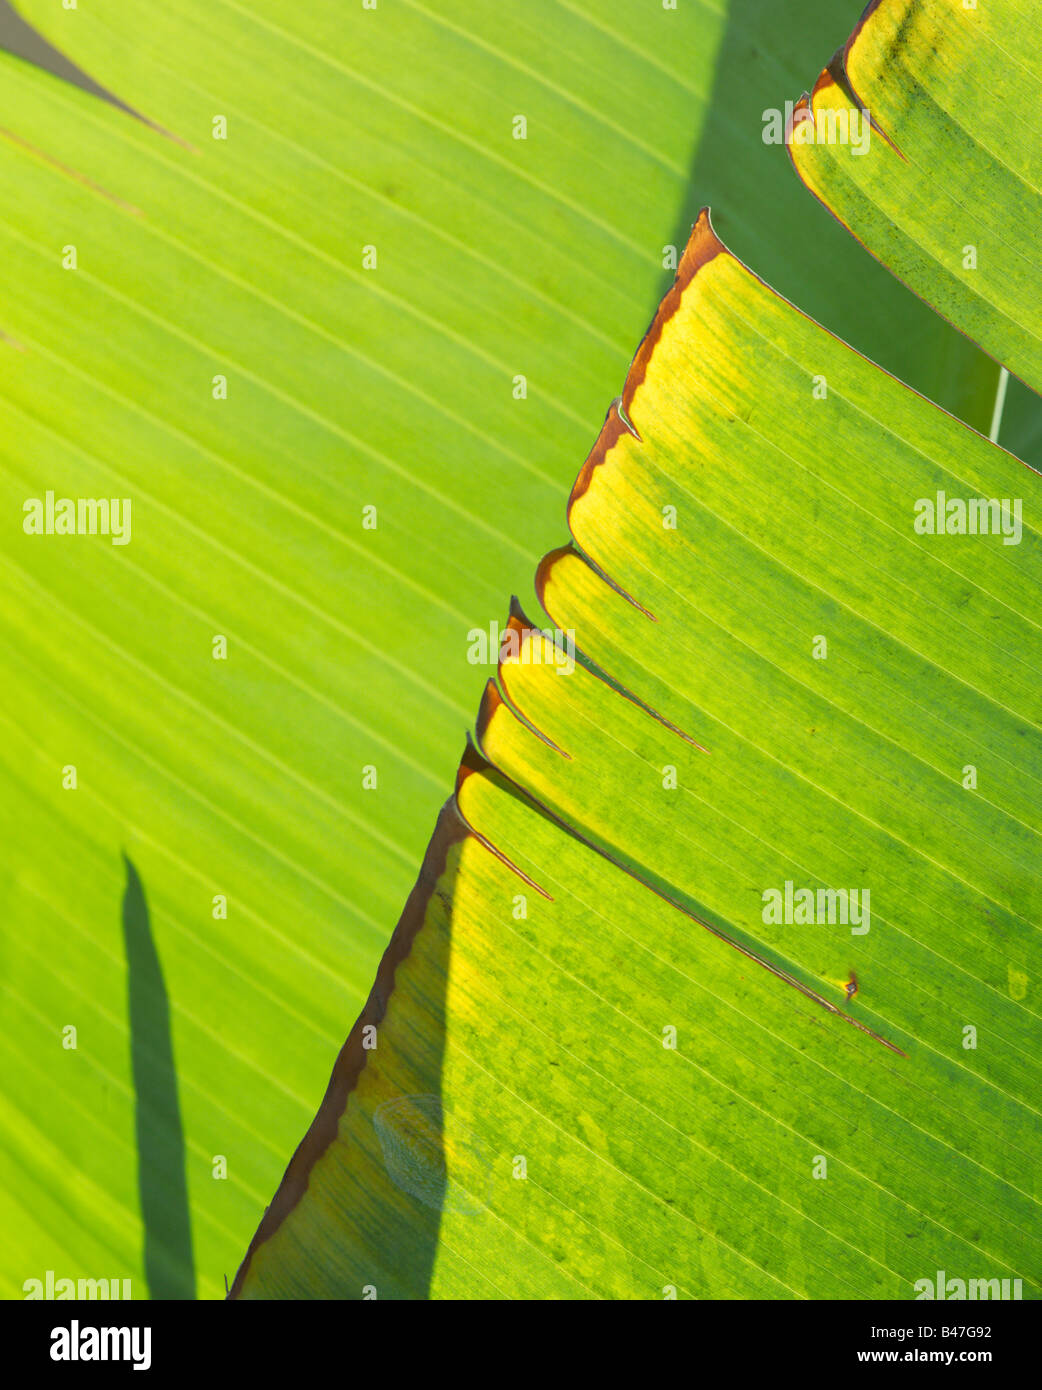 Banana leaves and shadows - Stock Image